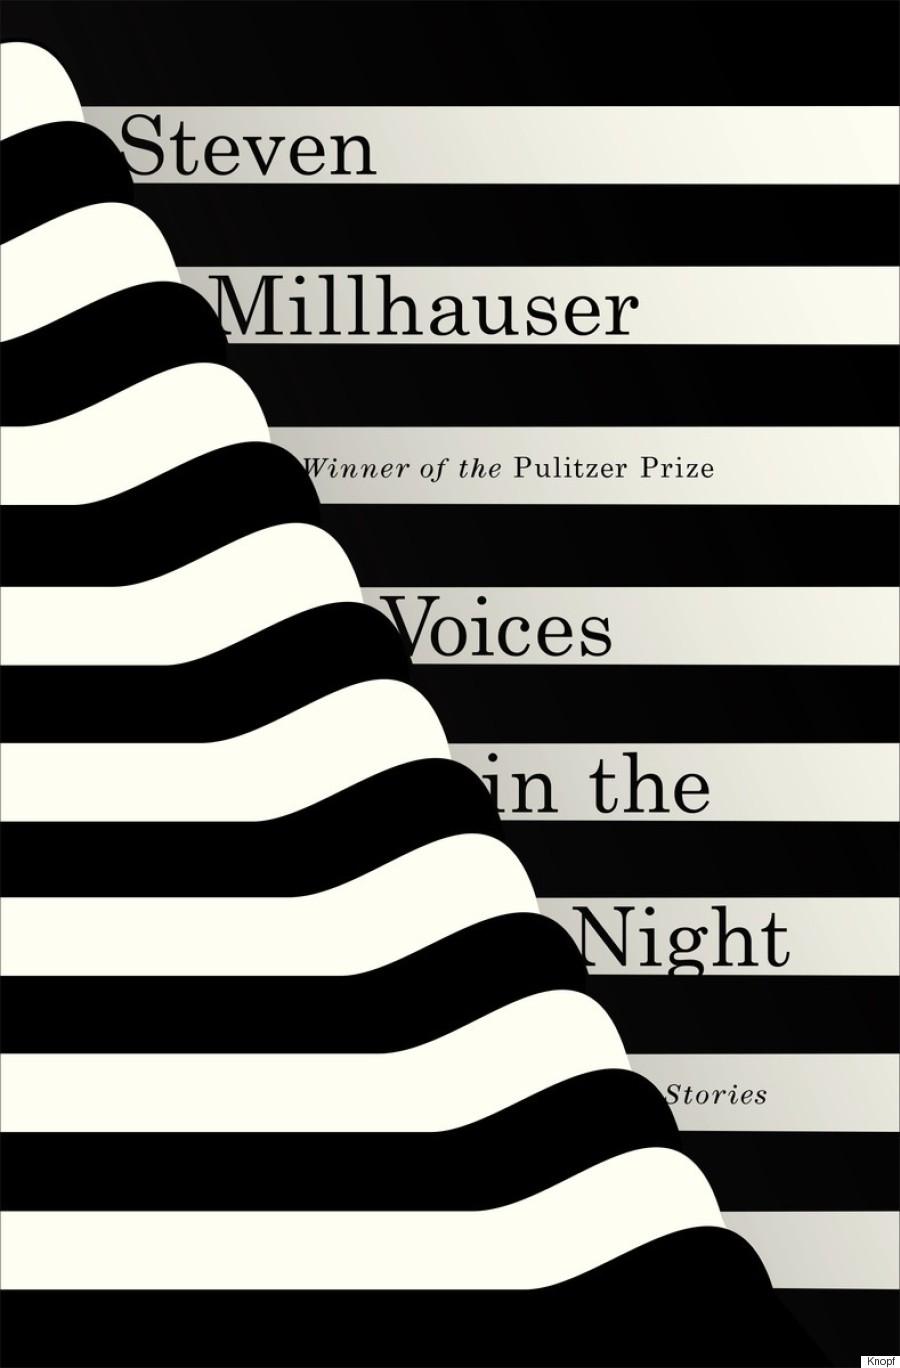 millhauser